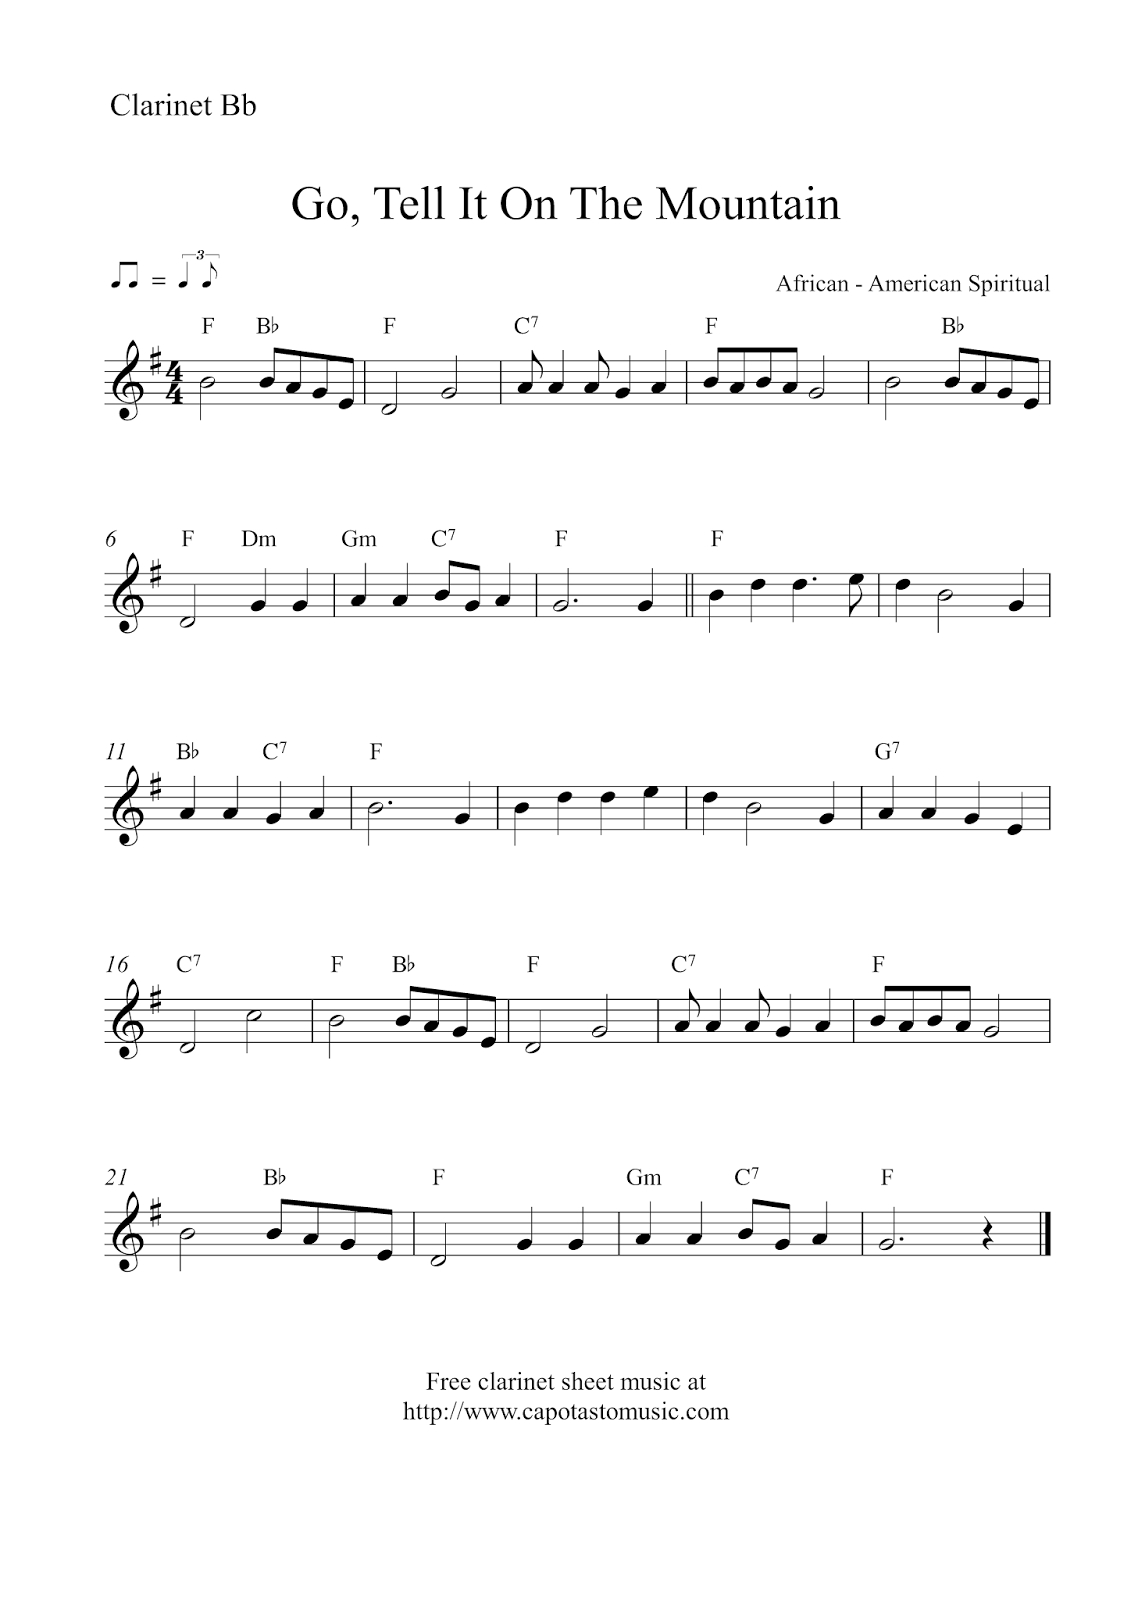 Free Sheet Music Scores | Music | Pinterest | Music Score, Free - Free Printable Christmas Sheet Music For Clarinet